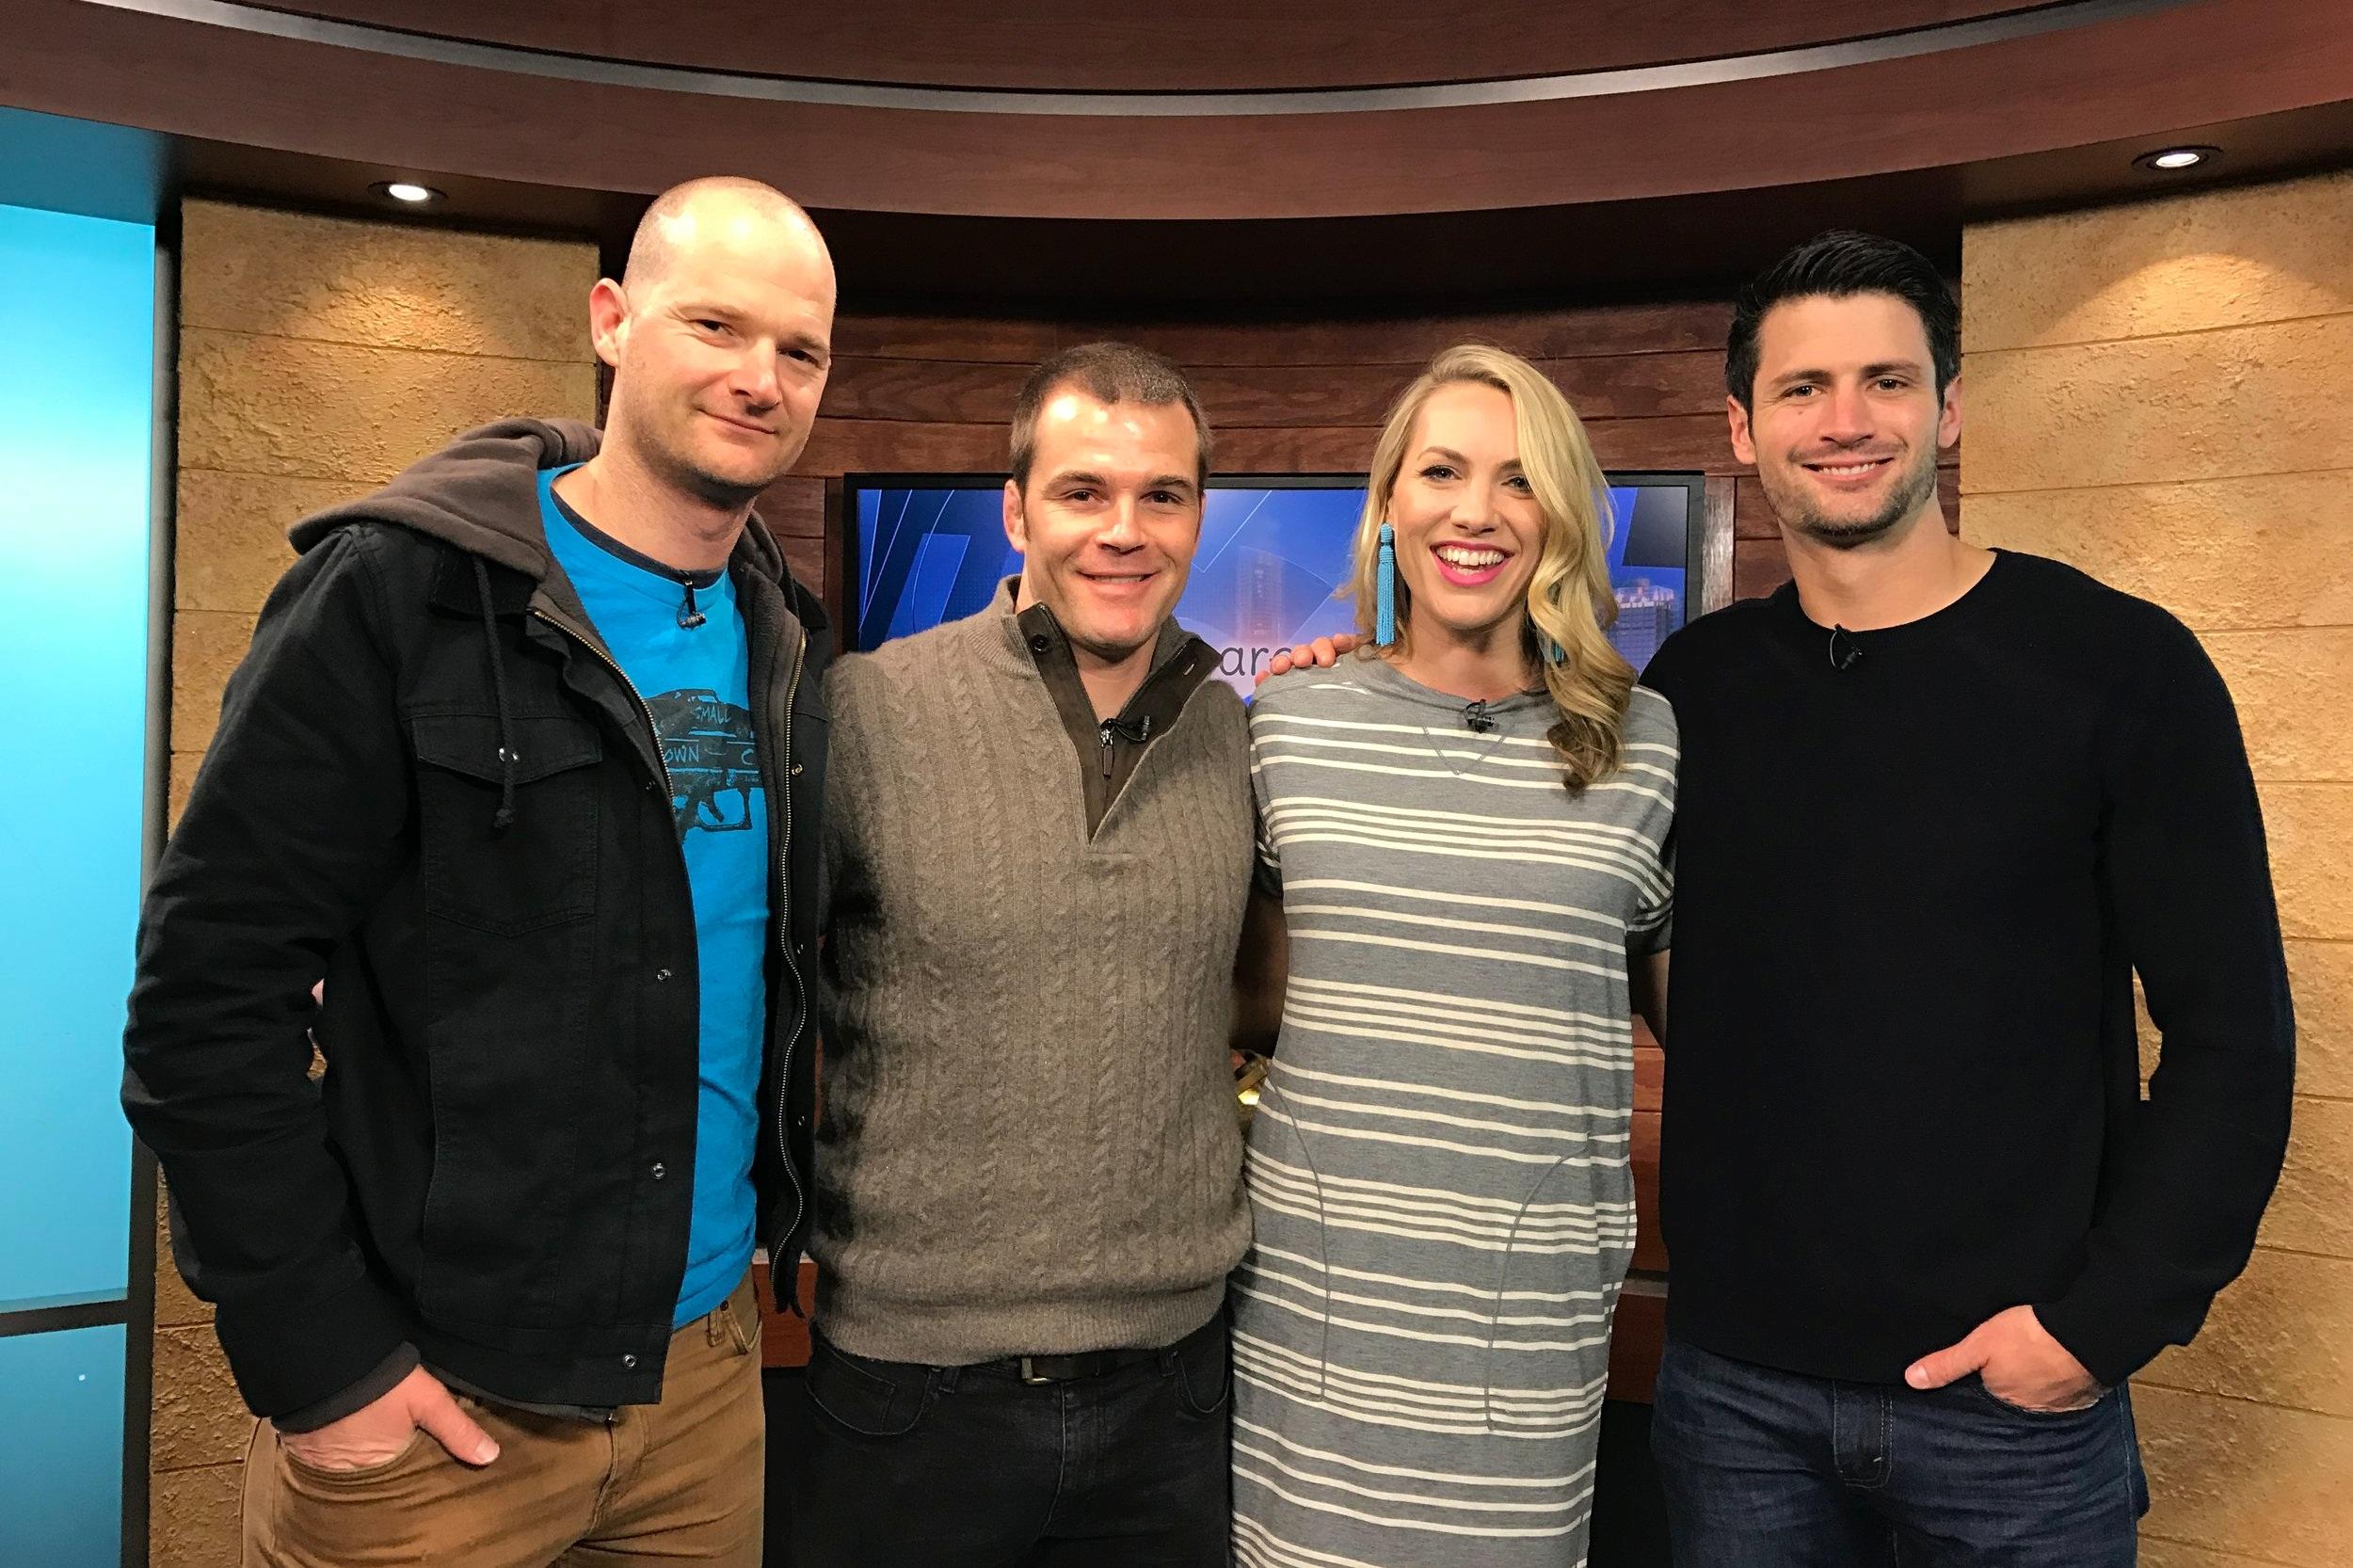 CBS Affiliate / KEYE-TV - Nelms Bros. + James Laffertydiscuss STC at SXSW